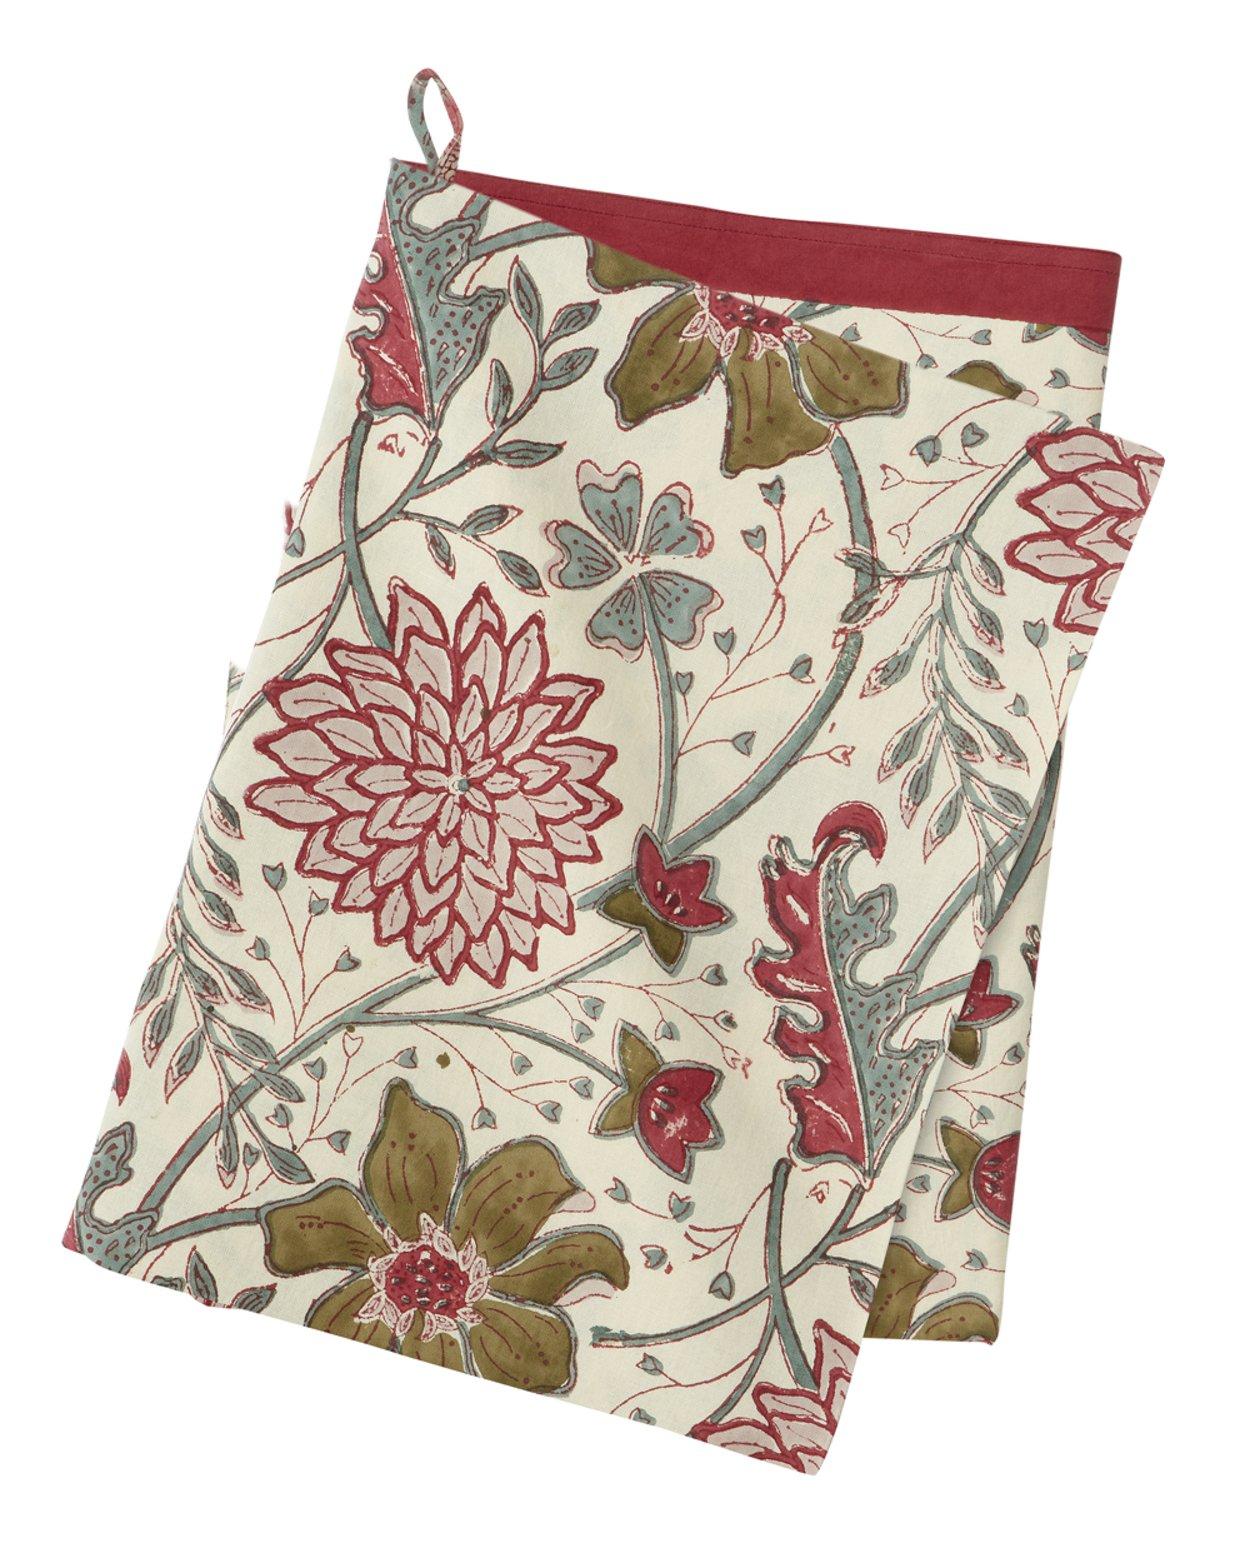 Sitapur Salsa Cotton Kitchen Towel